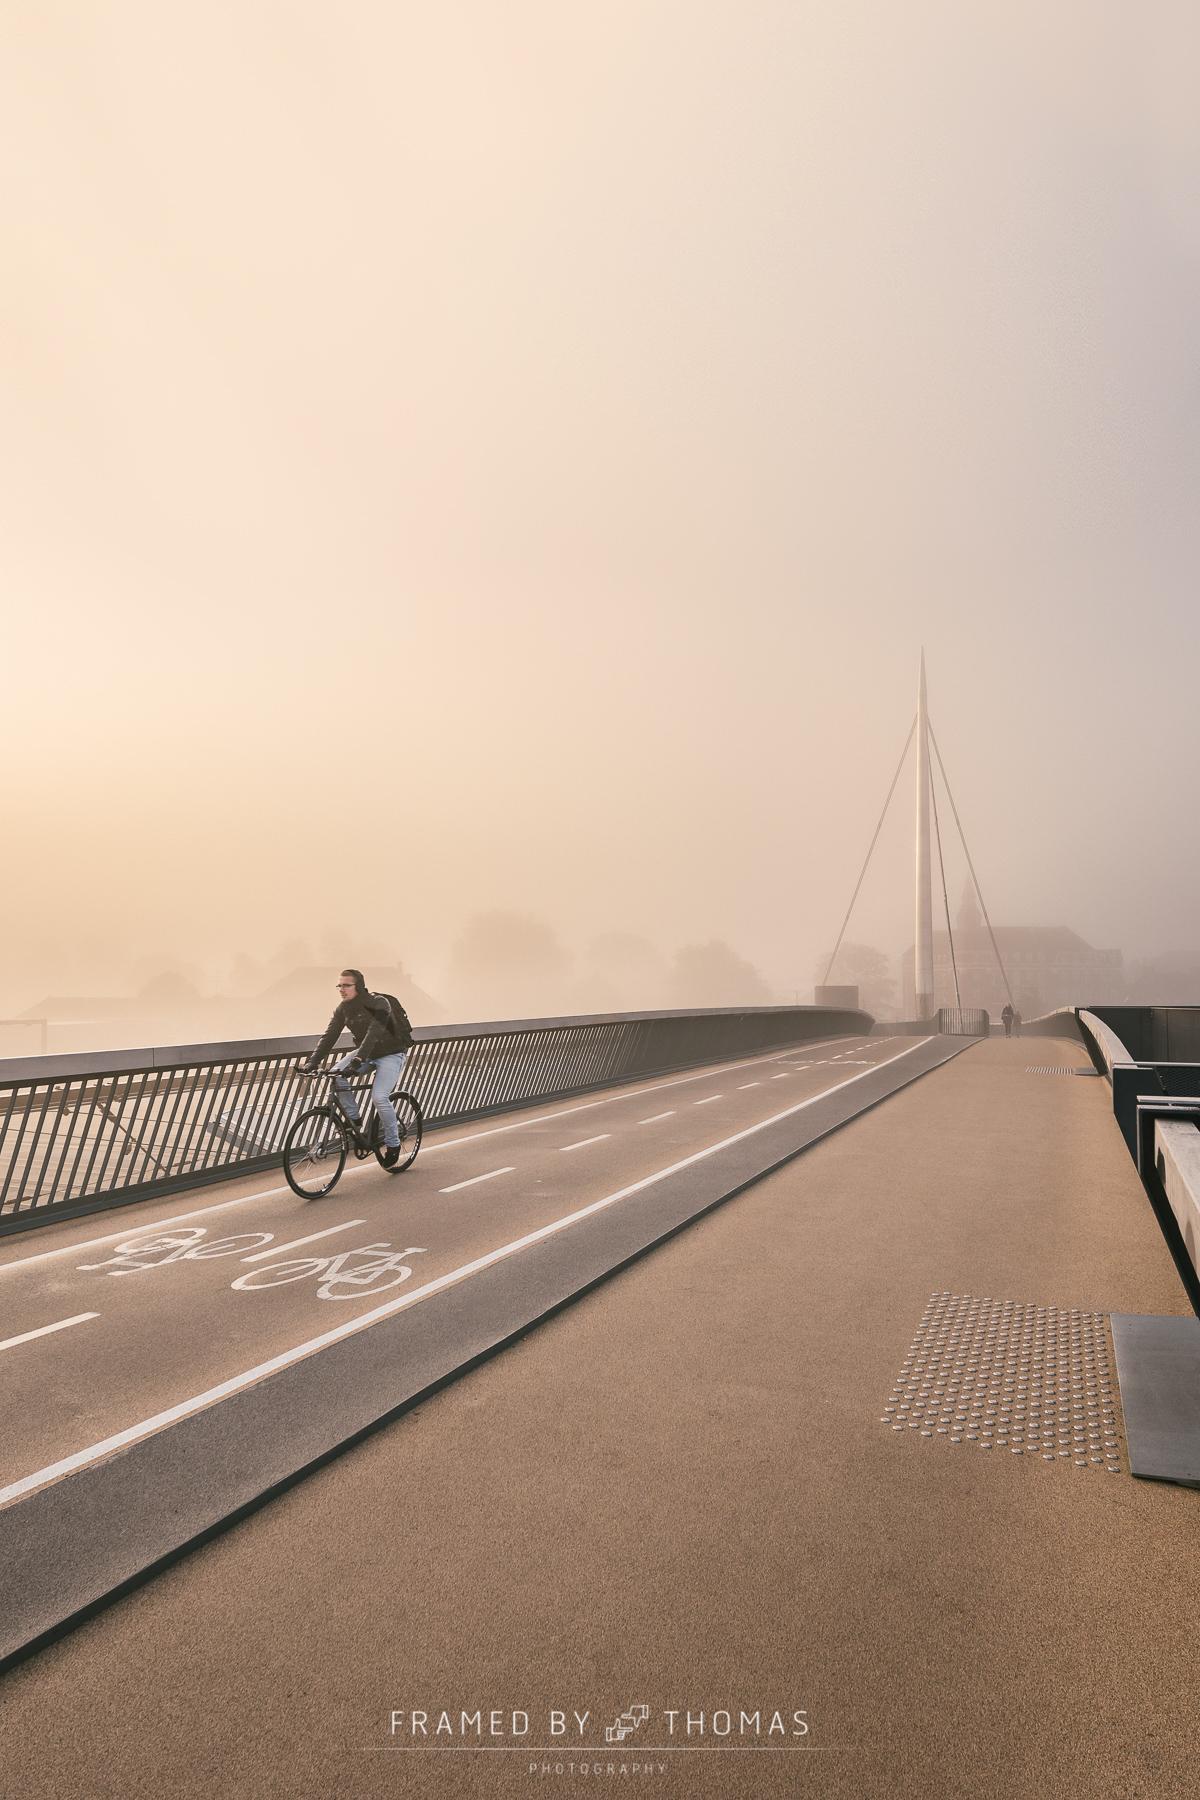 Odense, Denmark - October 5, 2015: Misty morning at Byens bro wi